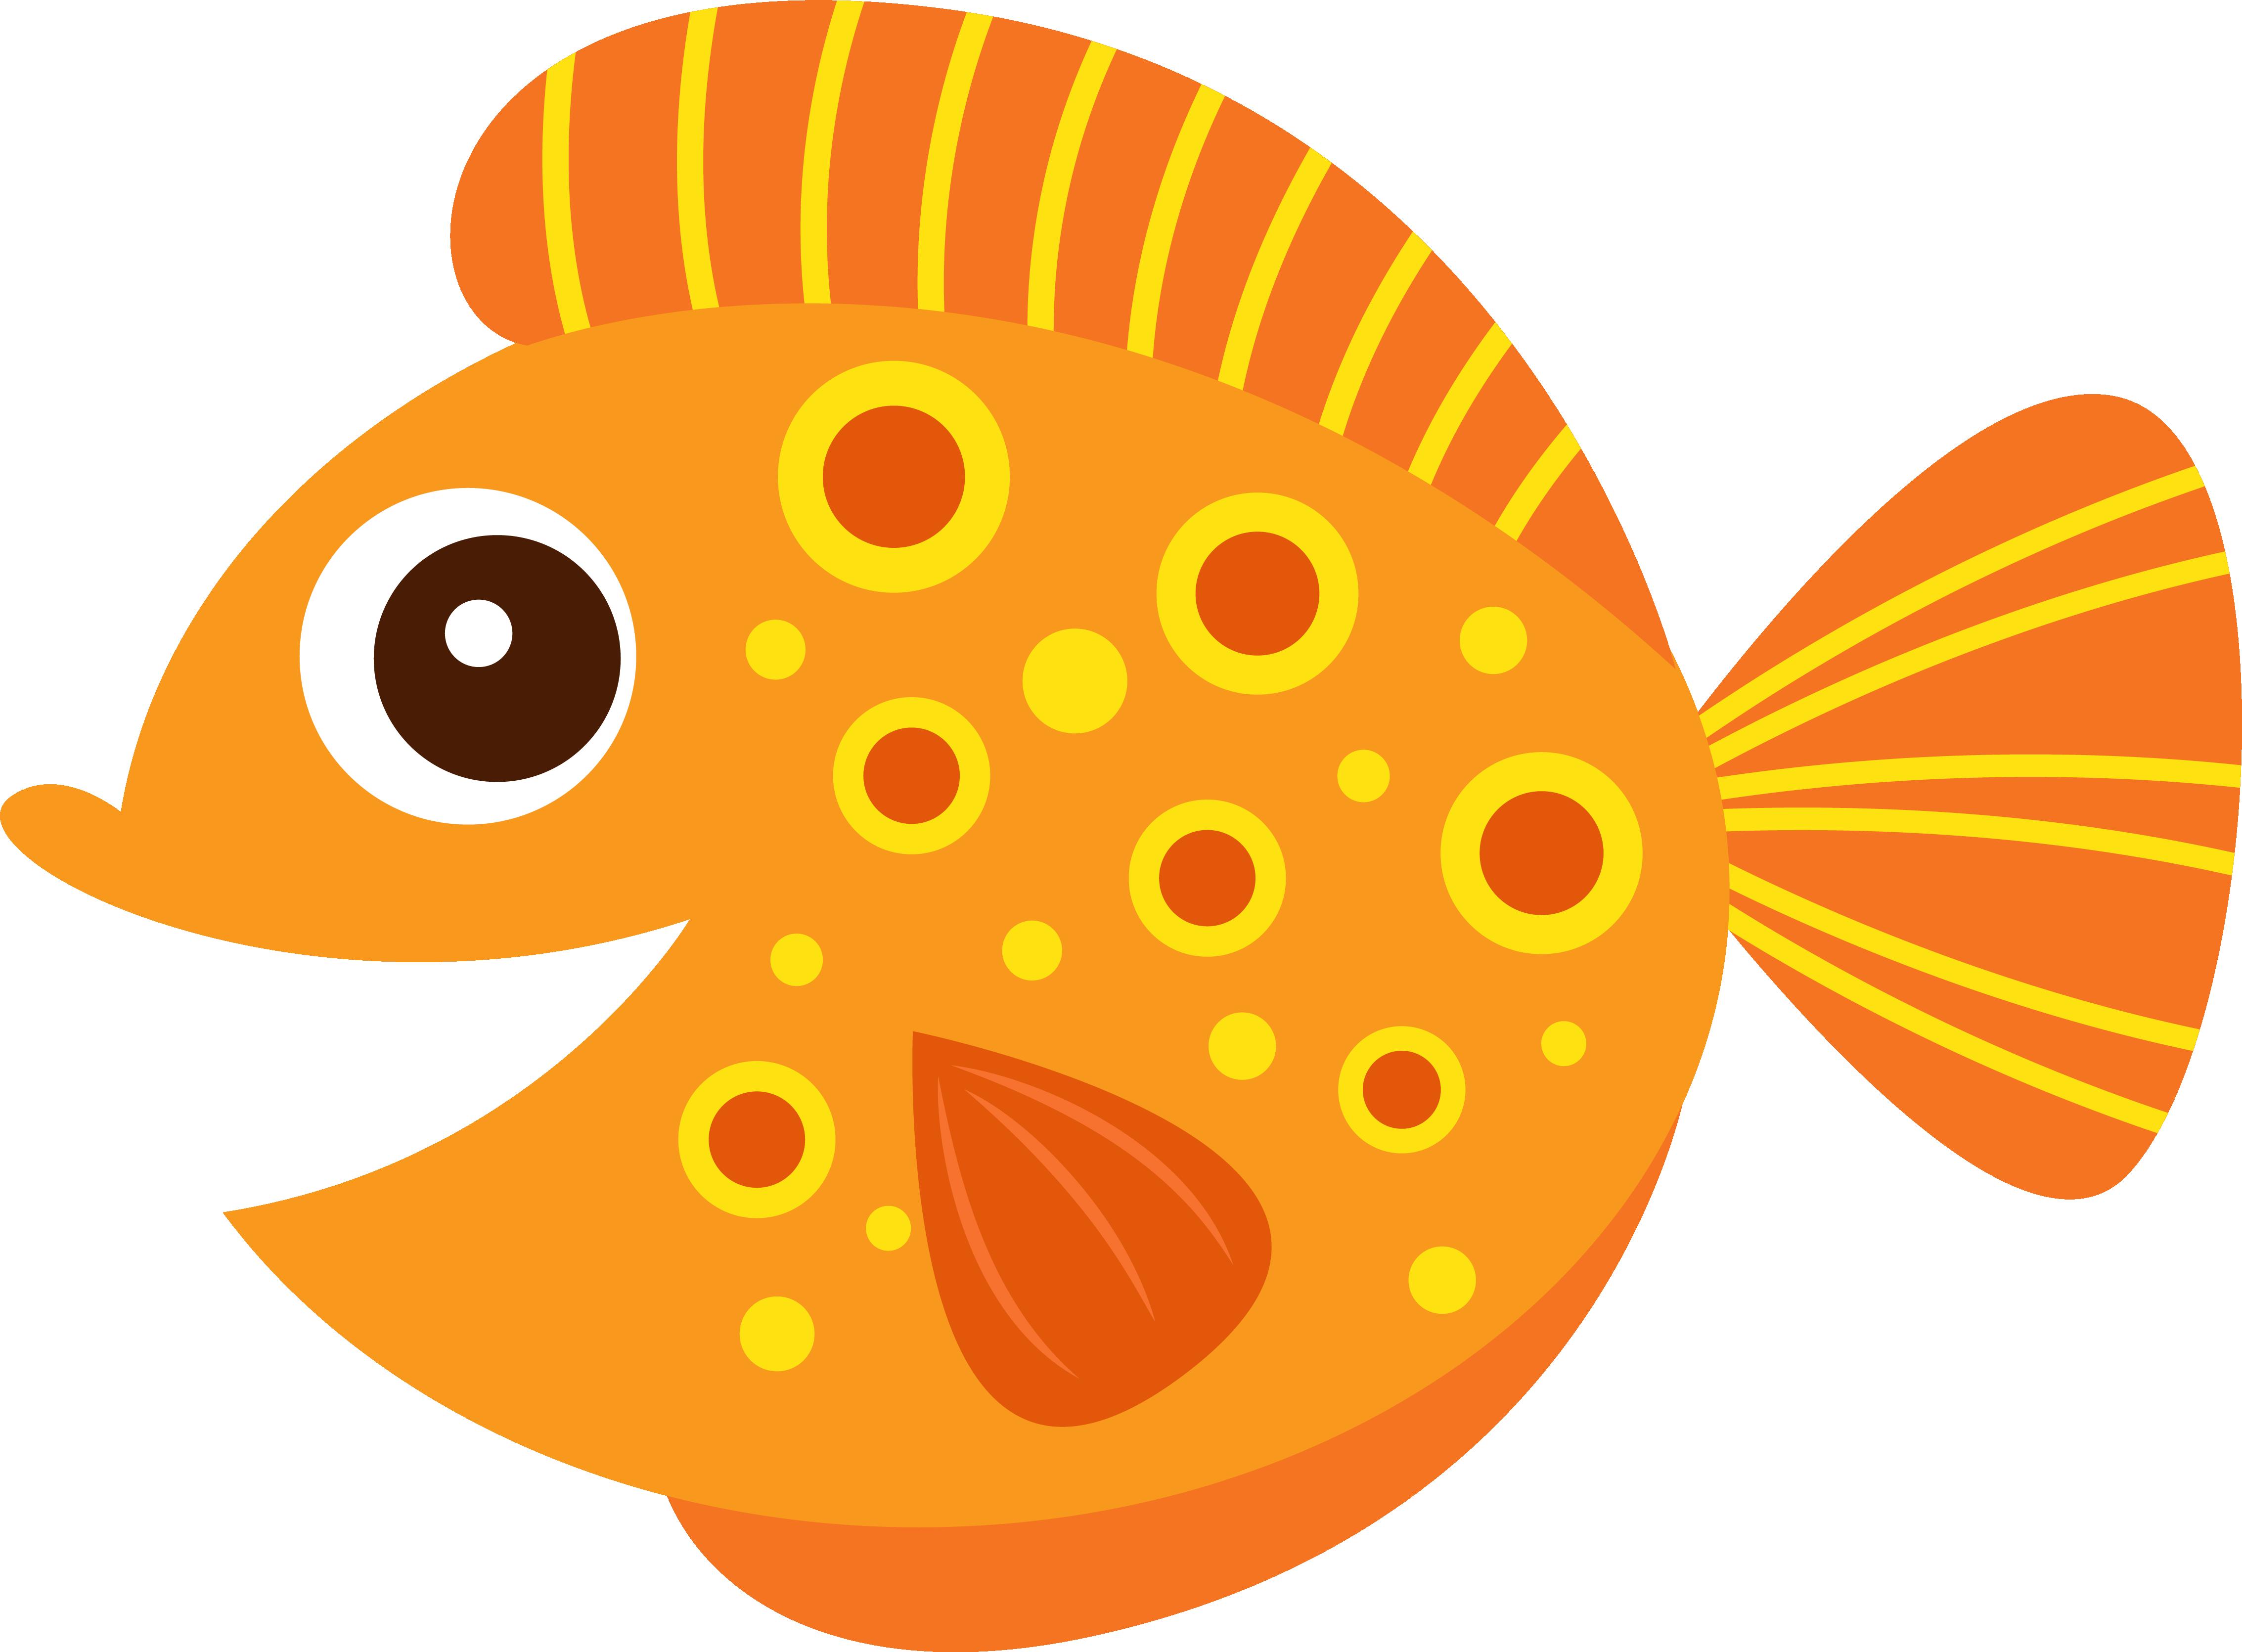 Fish Clipart Png Image 04 Png Fish Clipart Clip Art Fish